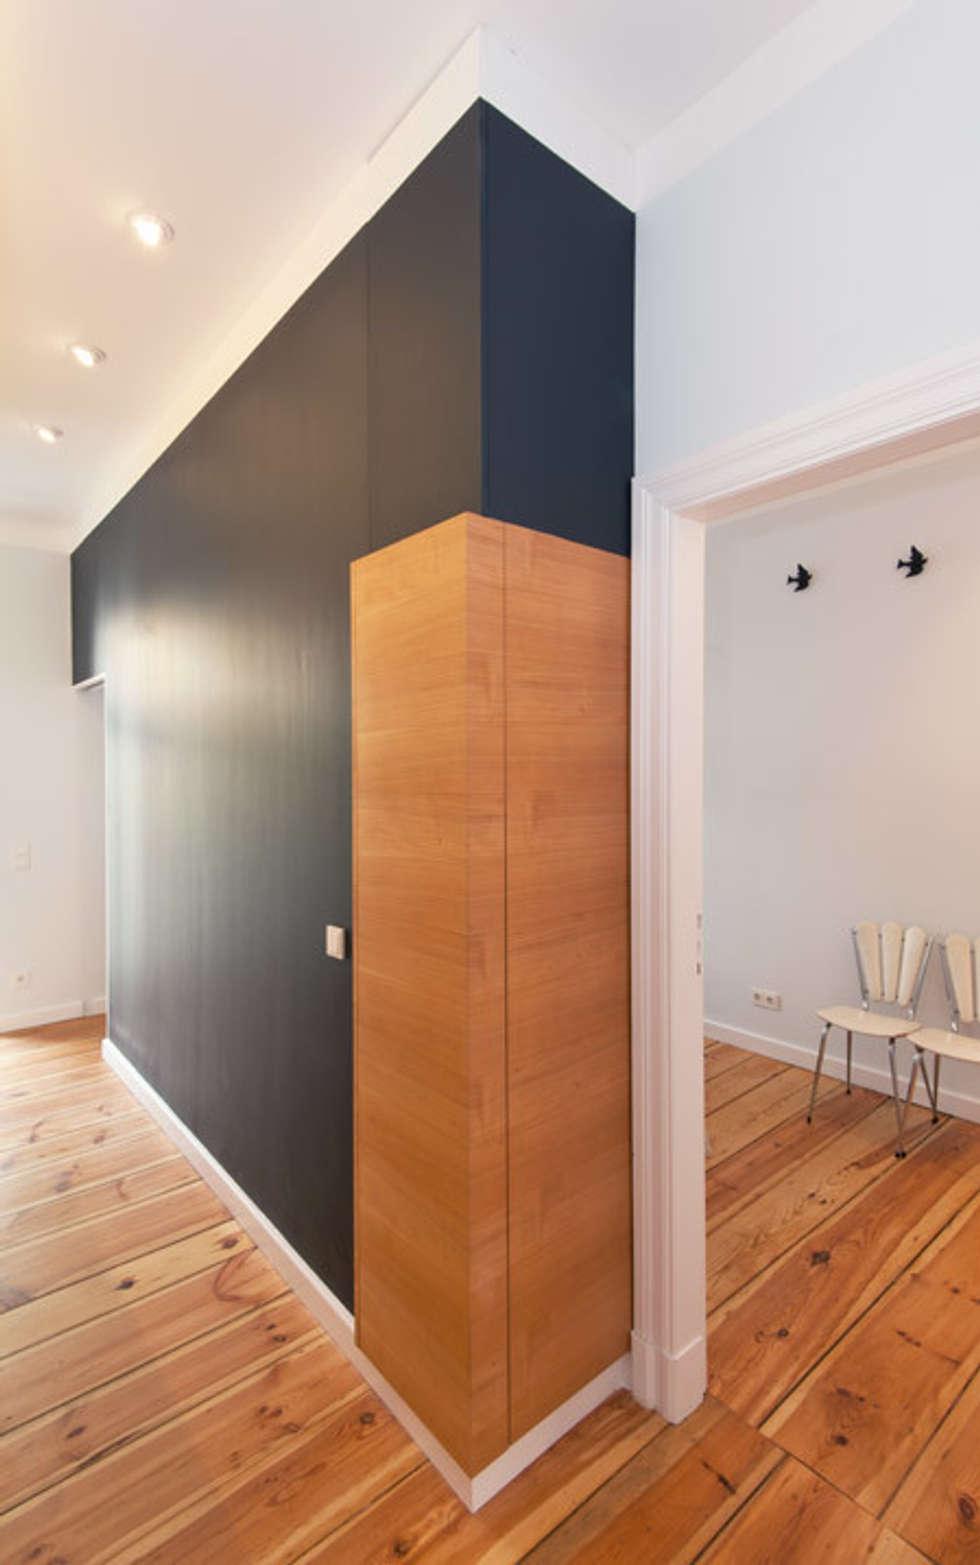 Wohnideen interior design einrichtungsideen bilder - Tafelfarbe fur wand ...